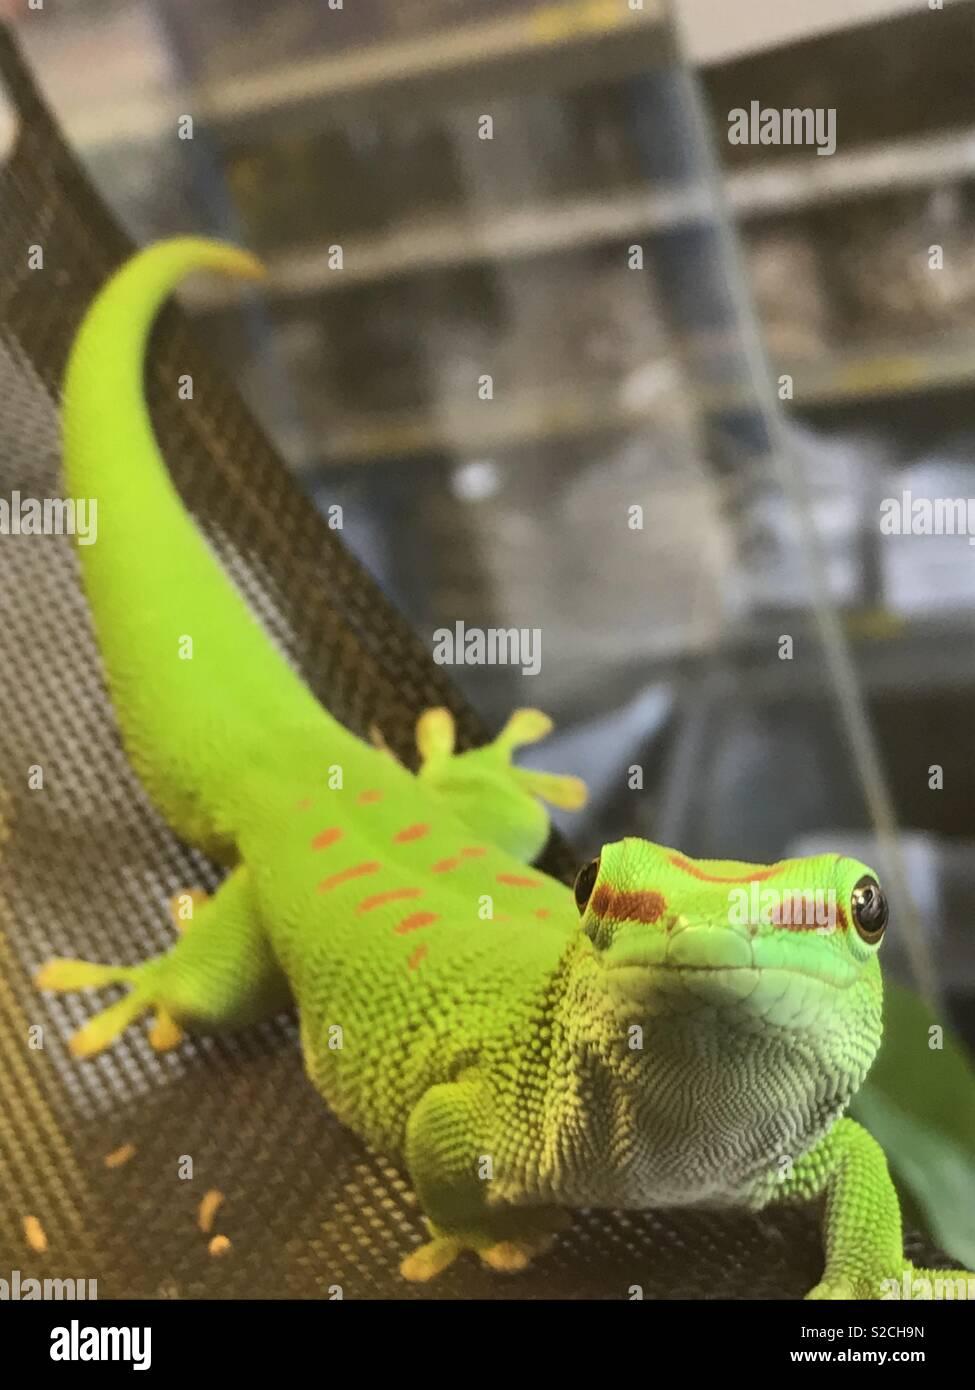 Madagascan day gecko - Stock Image